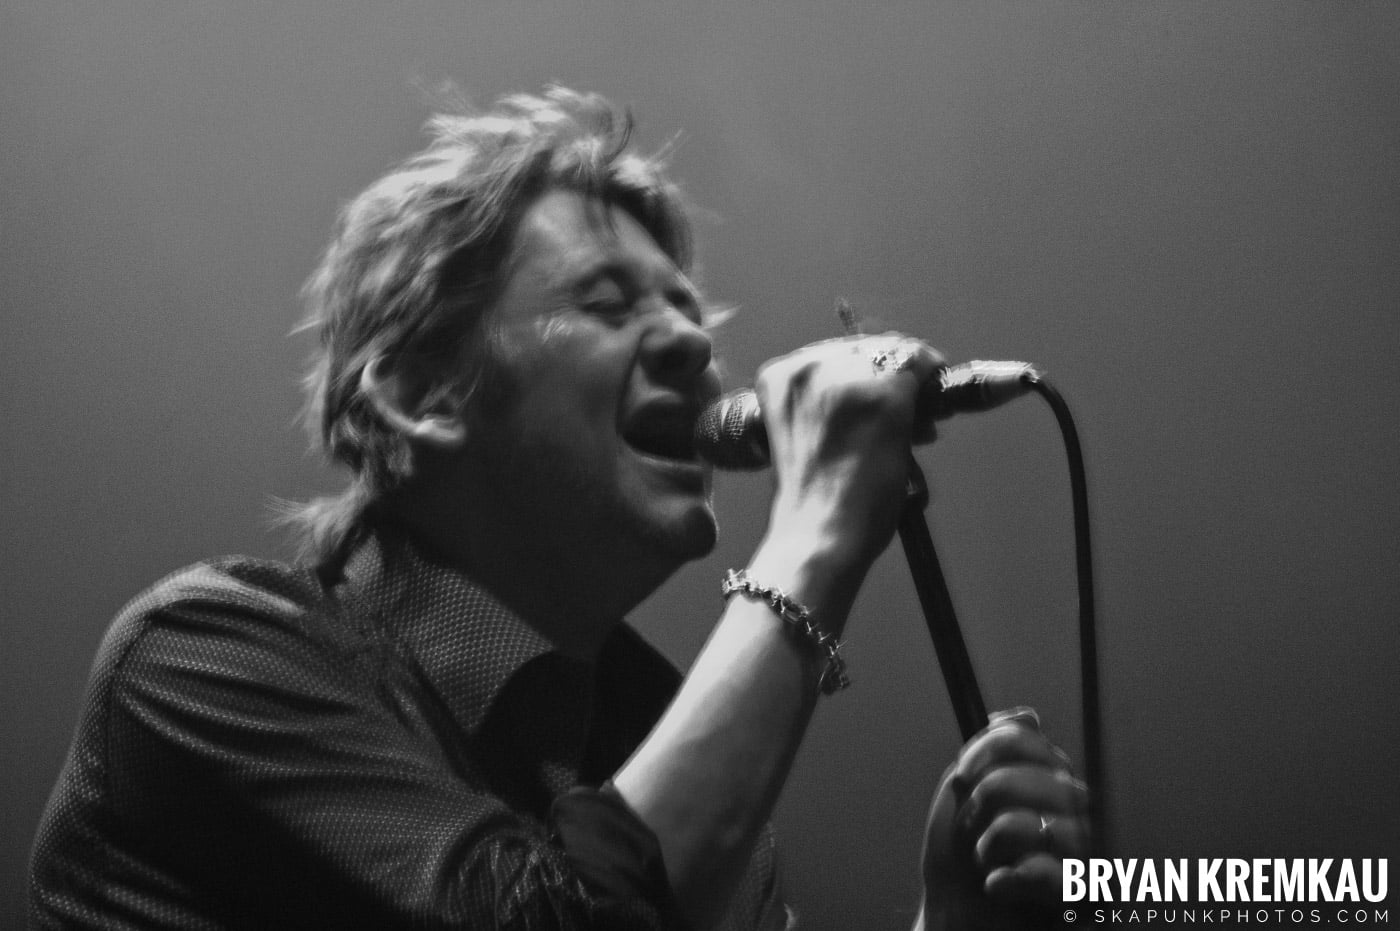 The Pogues @ Brixton Academy, London UK - 12.17.06 (14)